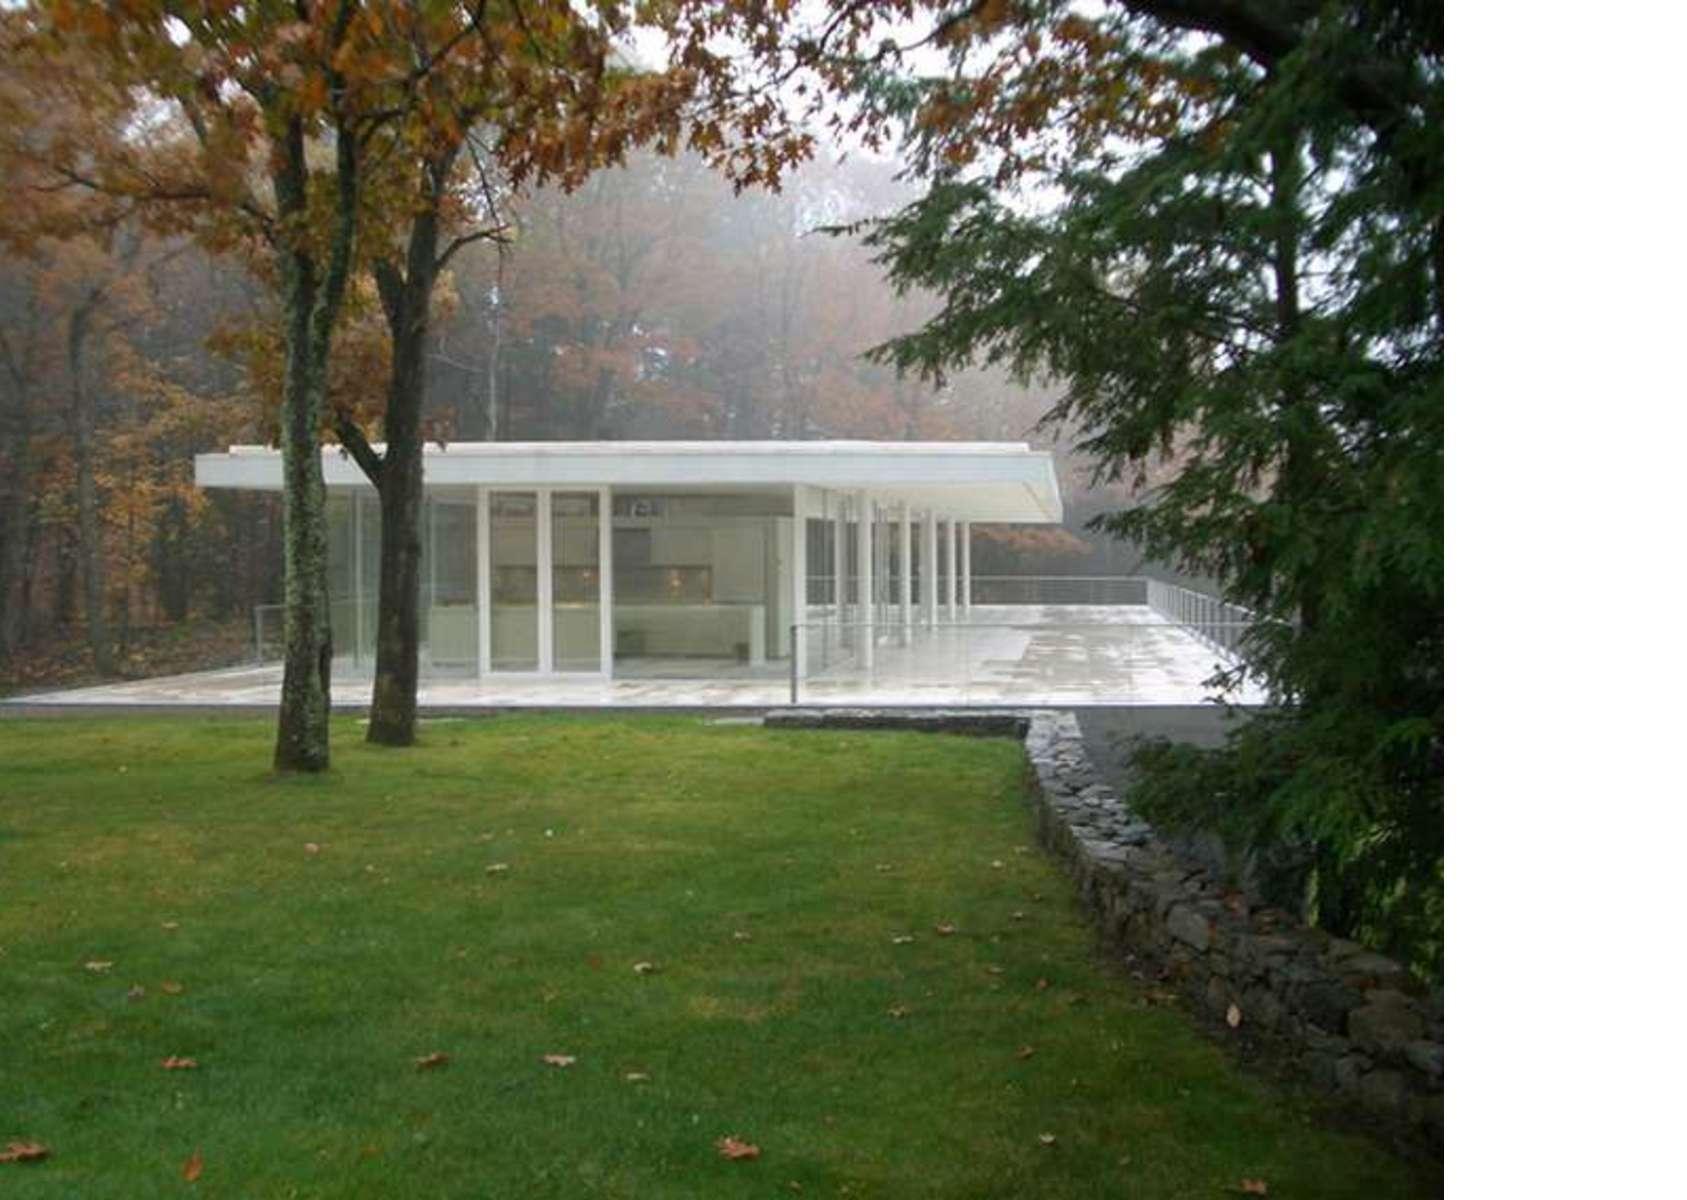 Alberto campo baeza royal academy of fine arts of san - Adi san fernando ...